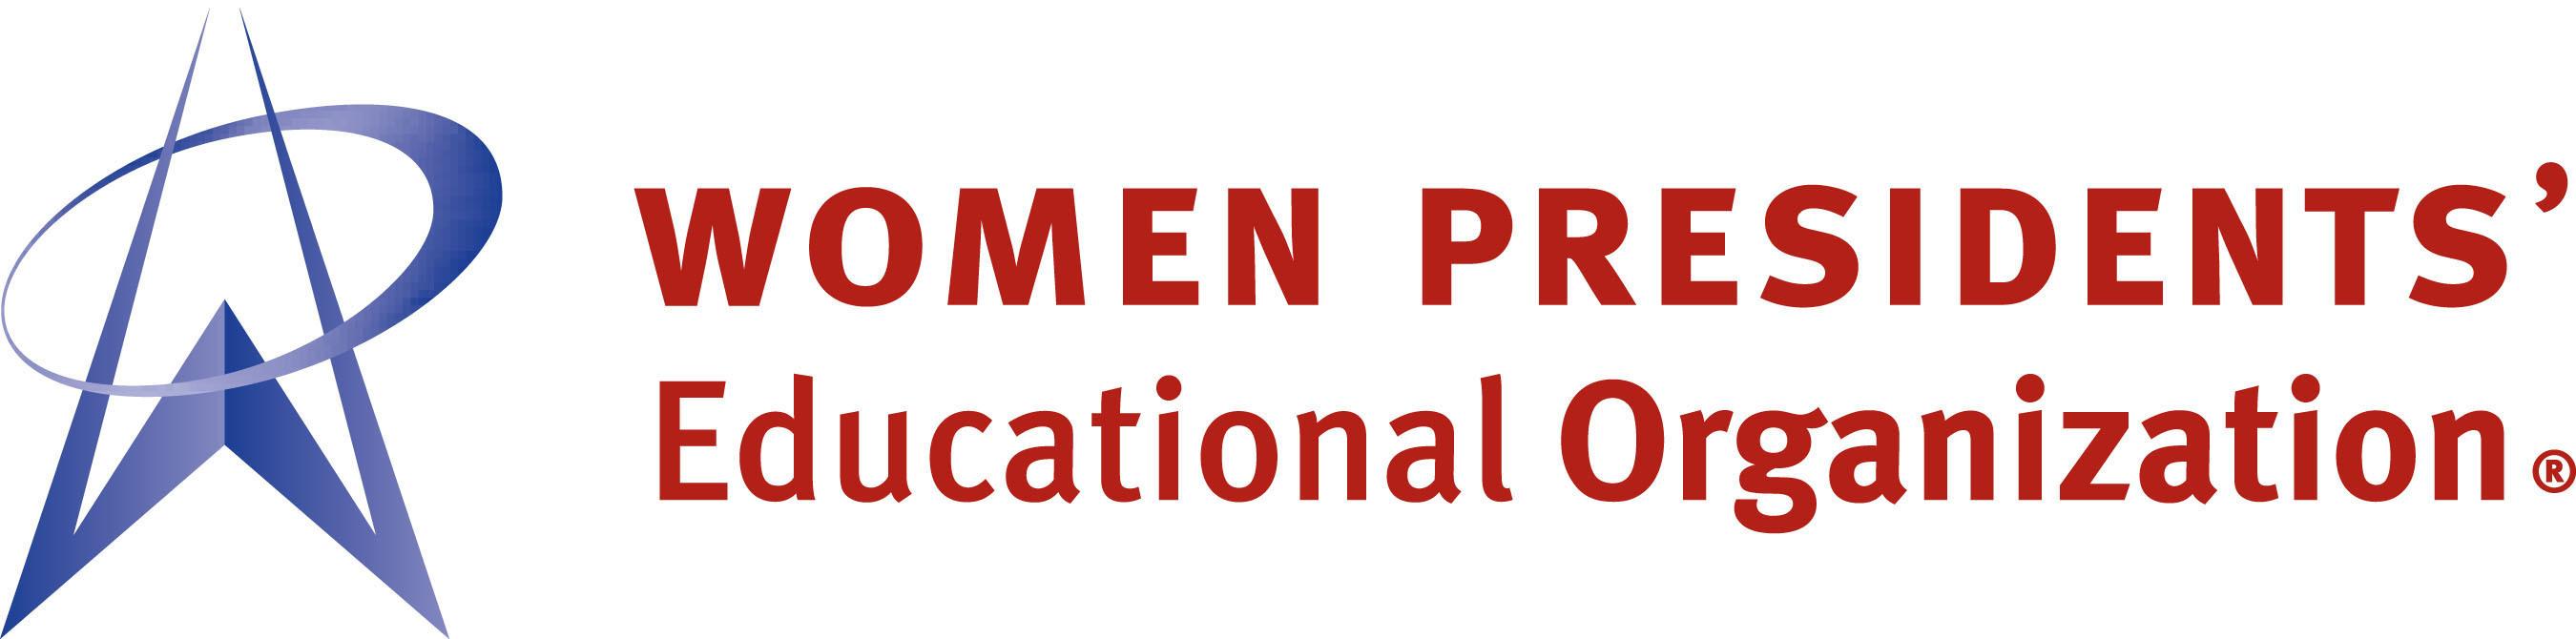 Women Presidents' Educational Organization logo.